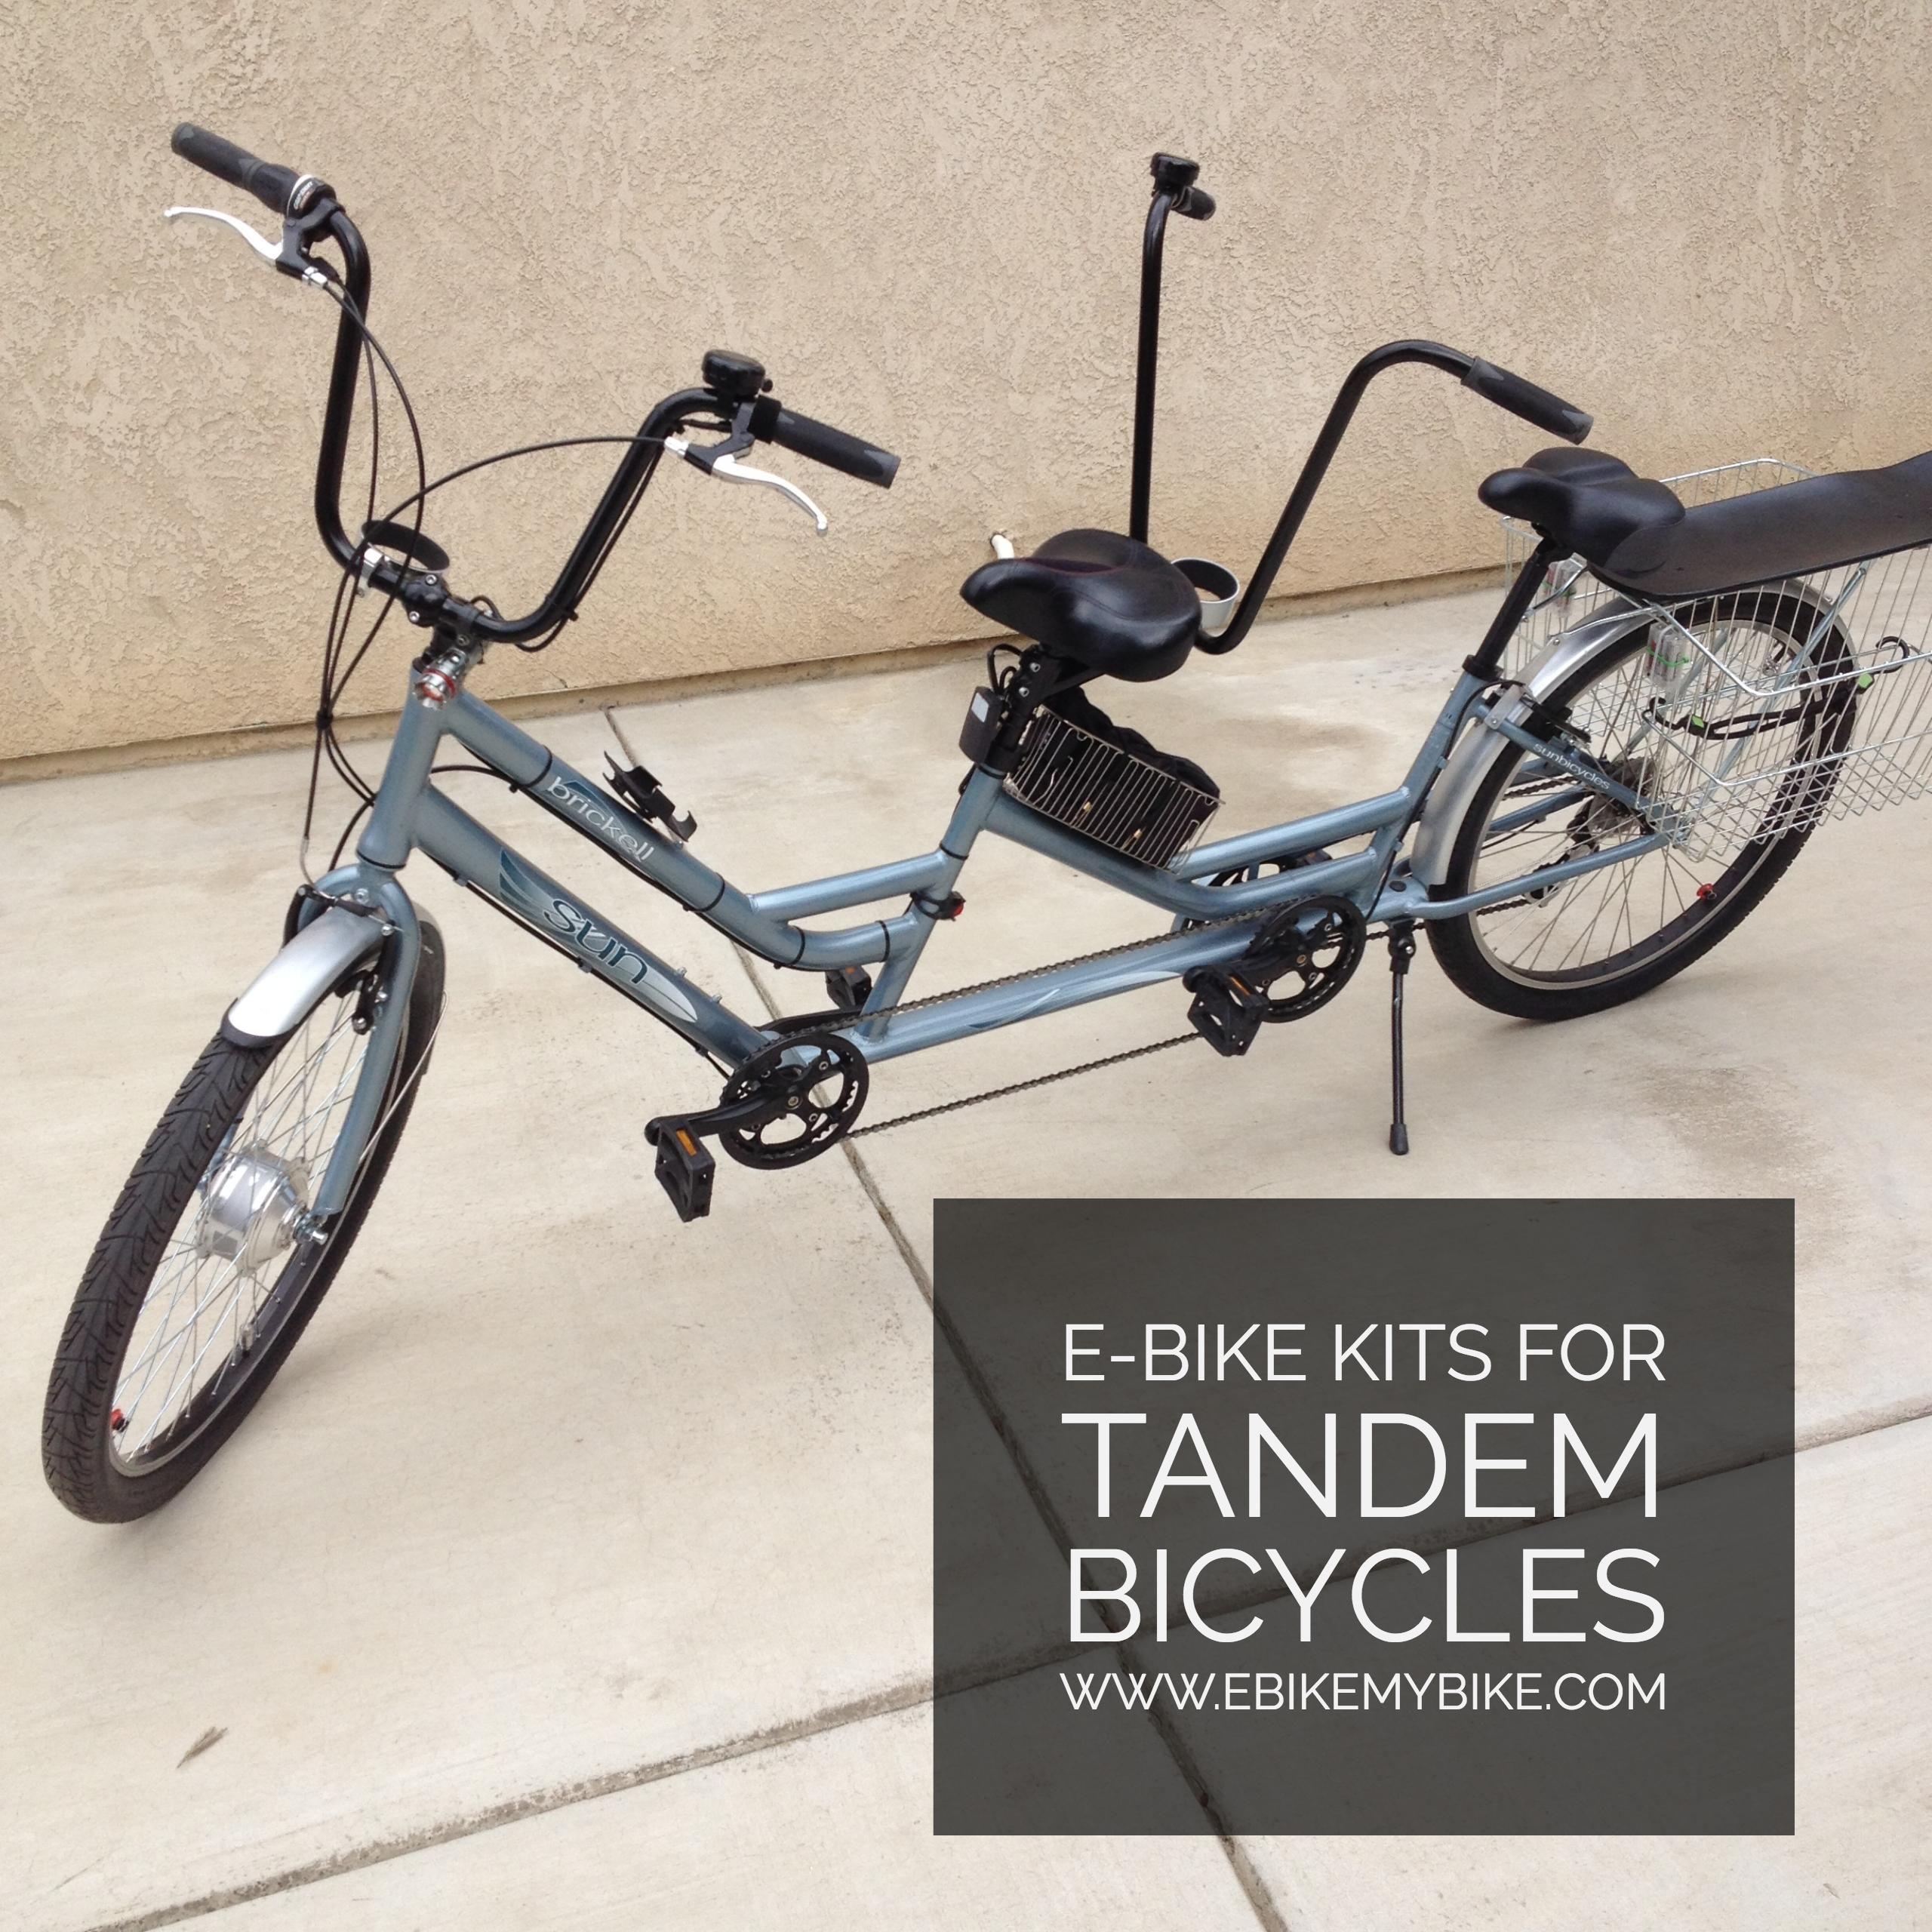 Leed Electric Bike Kit Meme 42 Jpg Bike Kit Electric Bike Kits E Bike Kit